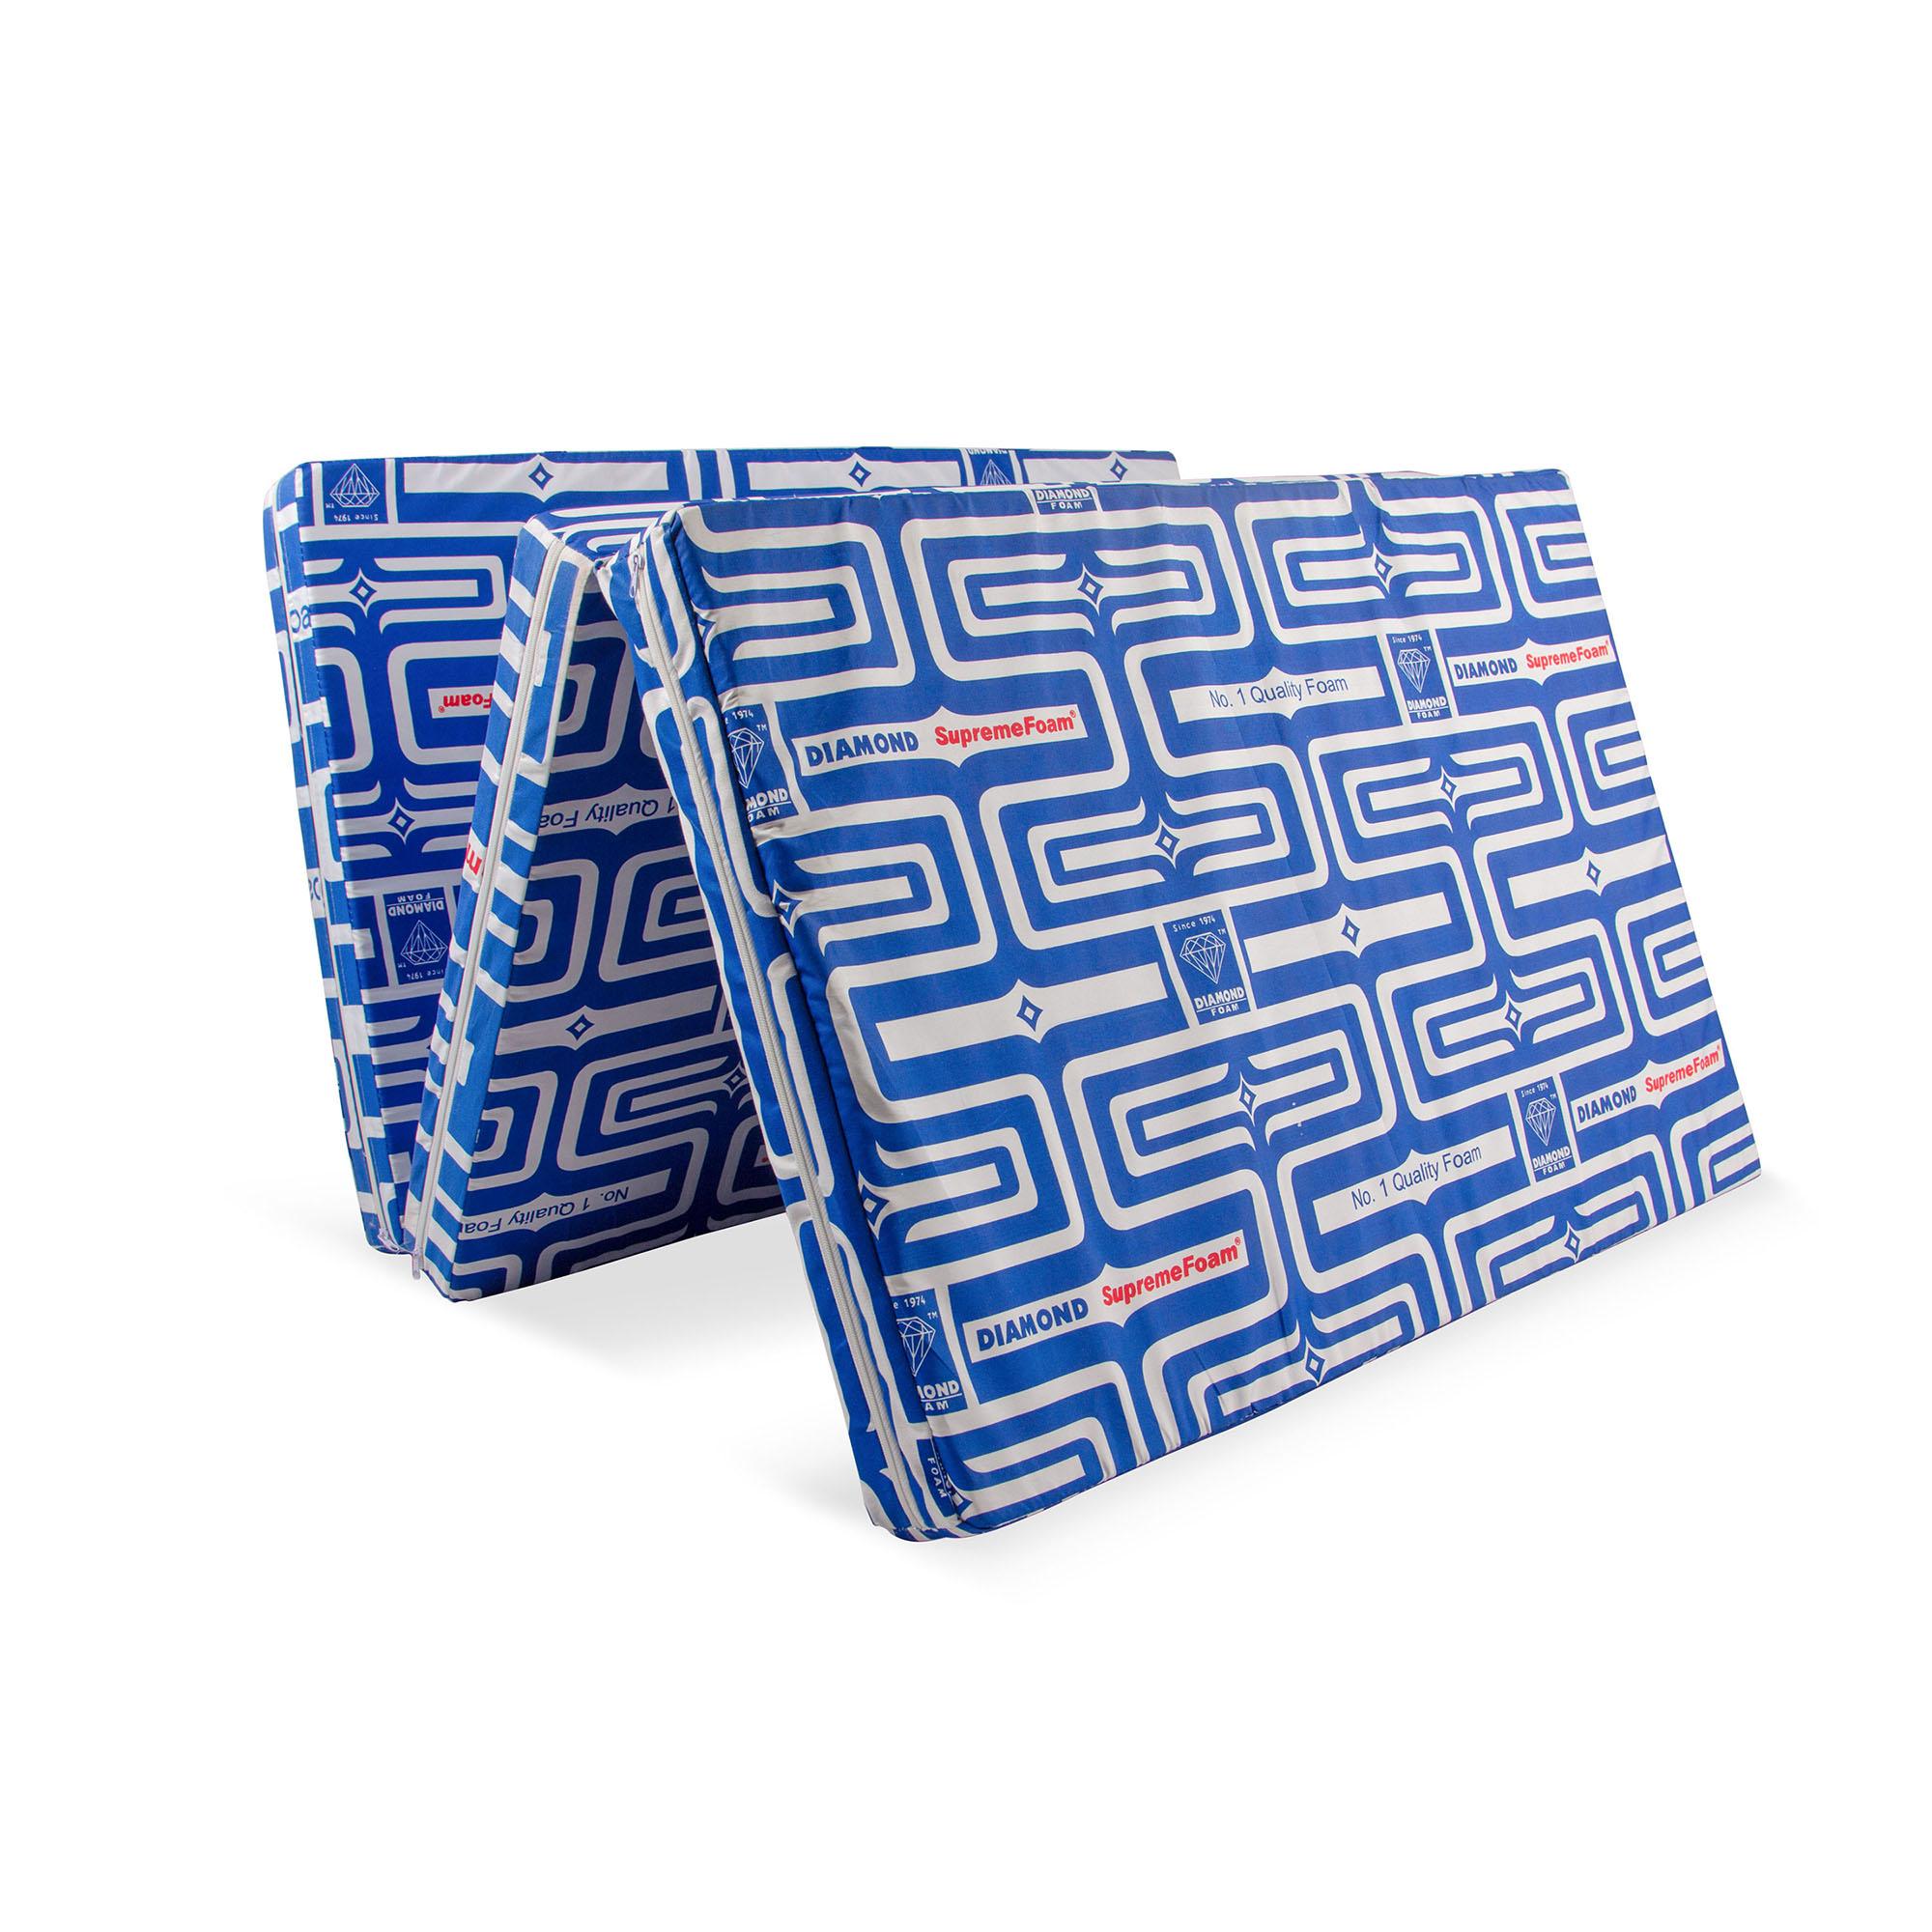 Folding Mattress Original Blue Buy Online At Best Prices In Pakistan Daraz Pk